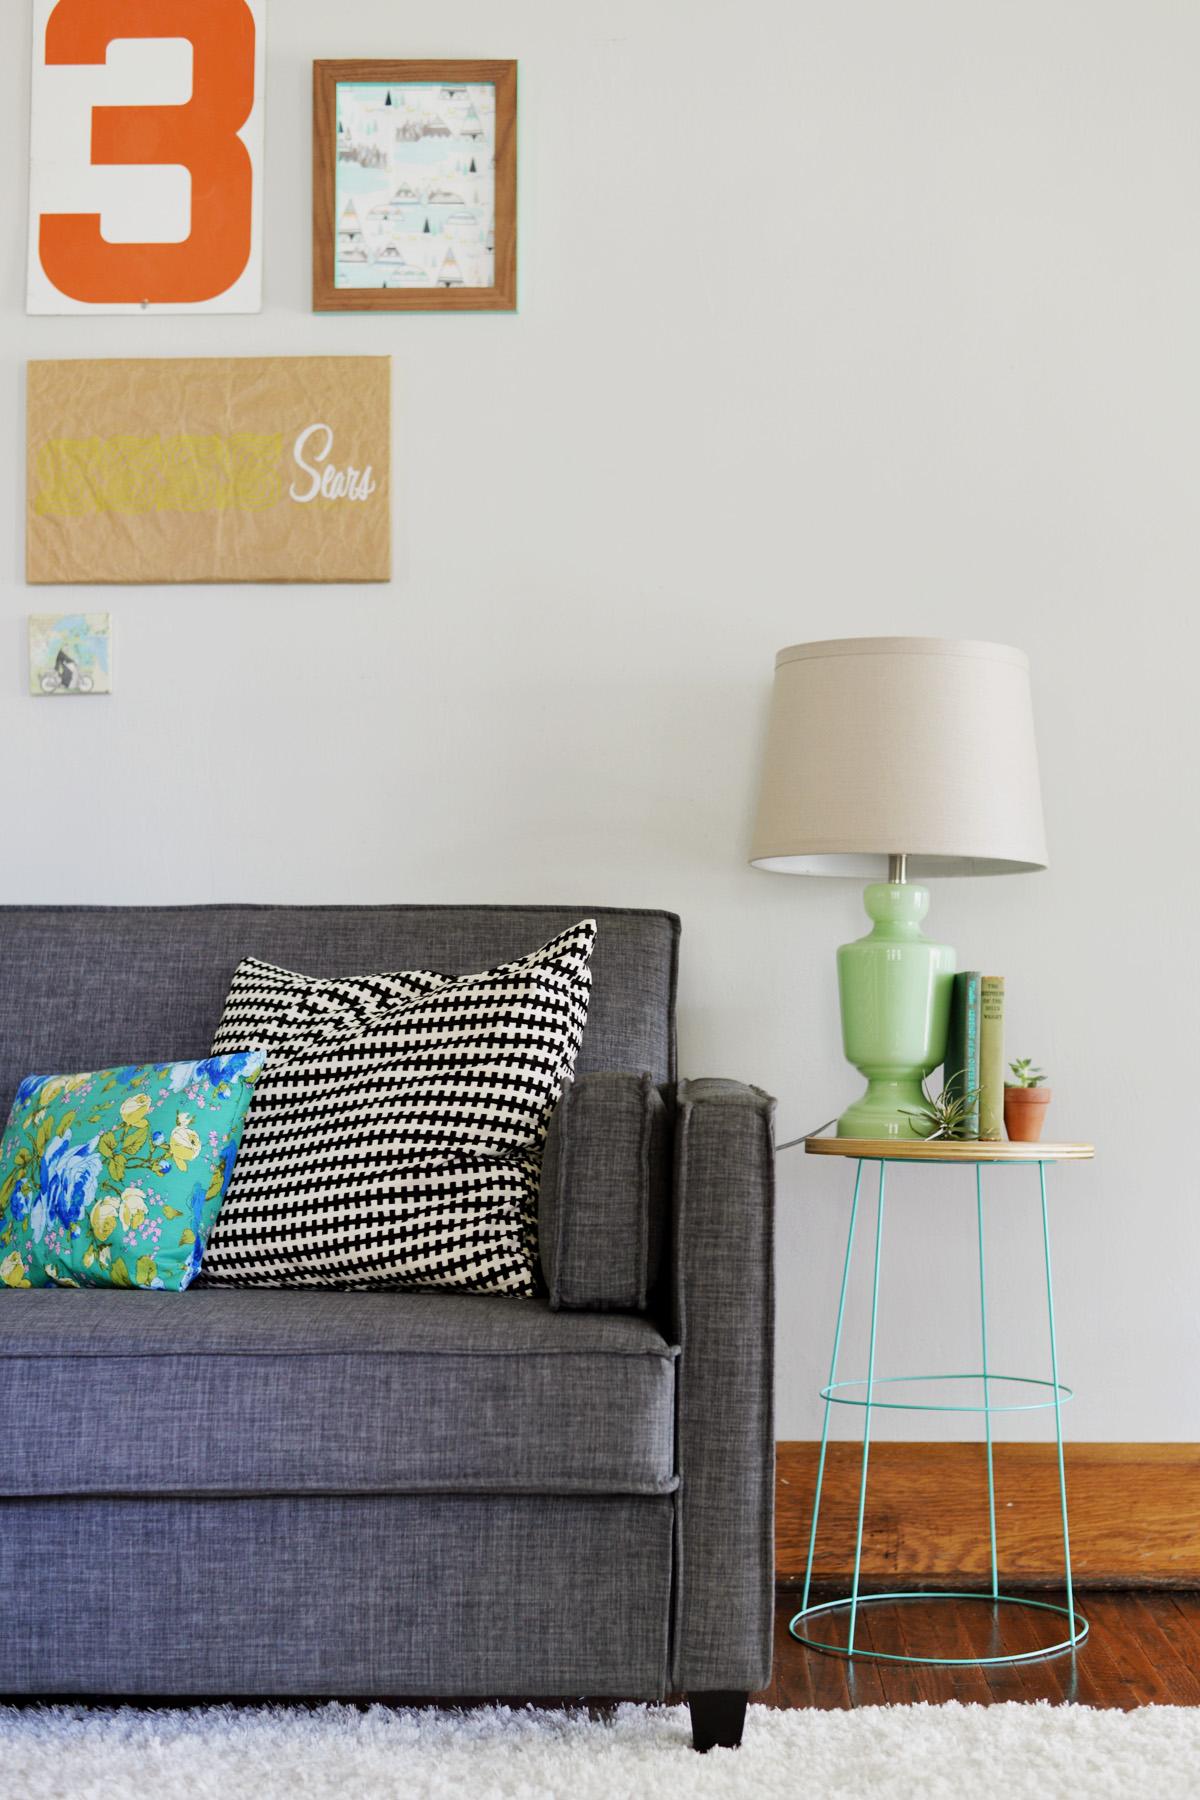 1564140060 927 35 fun and easy diy room decor ideas that wont break the bank - 35 Fun and Easy DIY Room Decor Ideas That Won't Break The Bank